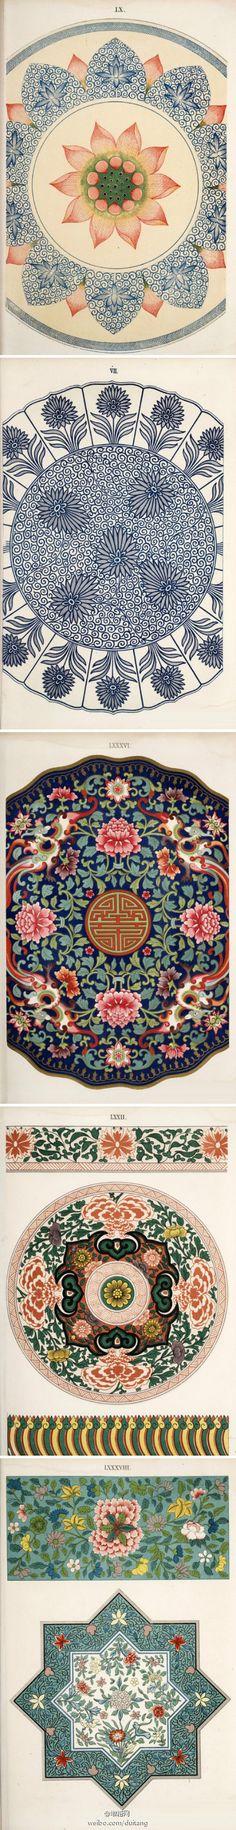 chinese traditional pattern design // Patterns, Fabrics, Prints & Dessins